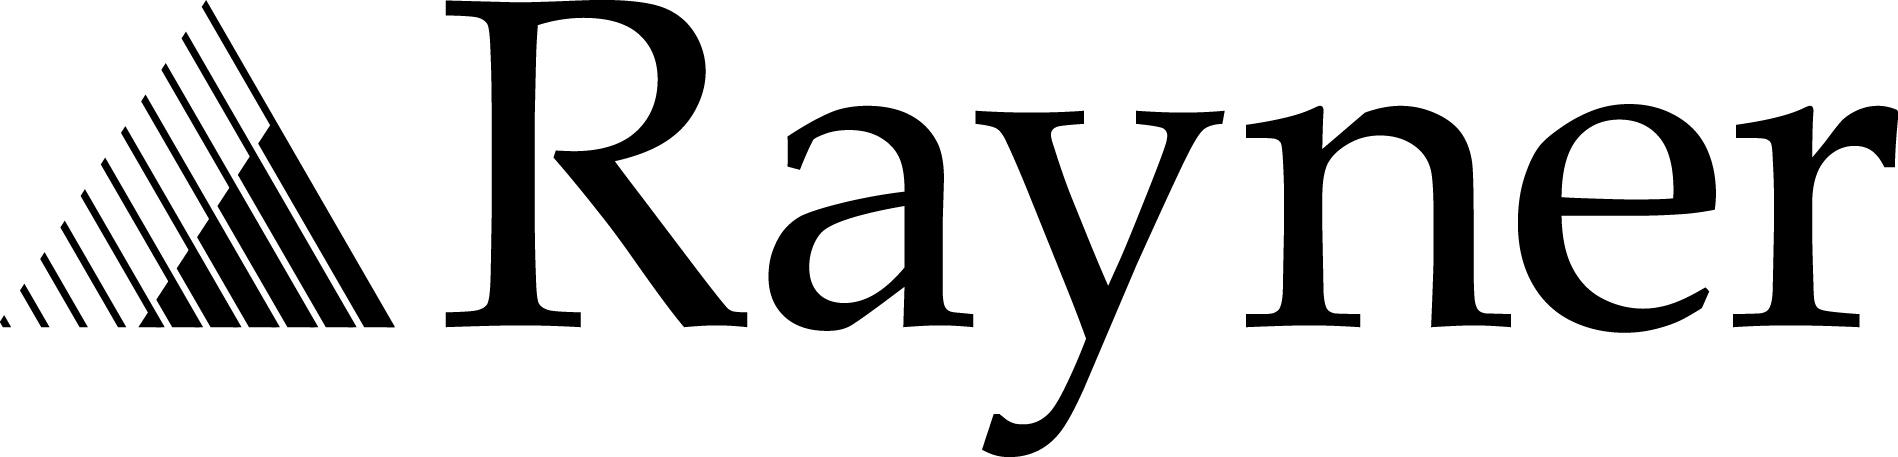 Rayner Surgical GmbH